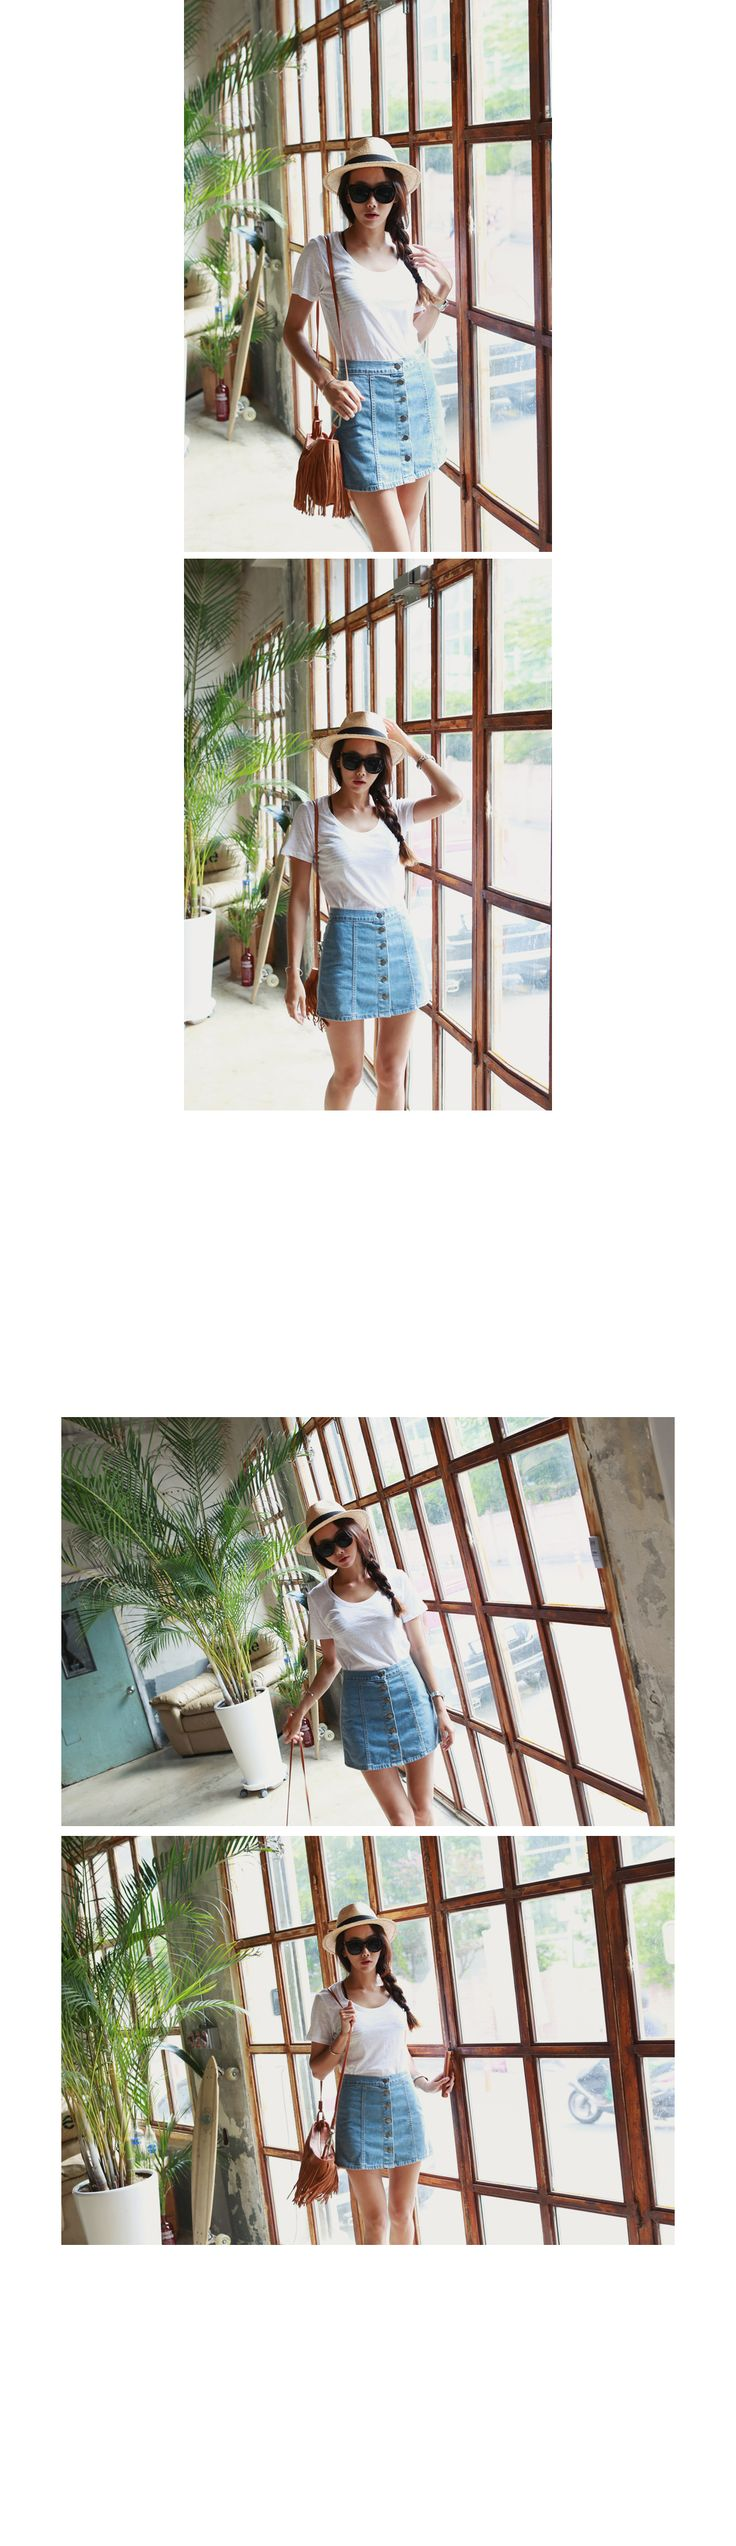 【Iamyuri】伸縮性のないコットン素材を使ったデニムスカートです。 シンプルなミニ丈デザインで足がすらっと長く見えるアイテム☆ フロントボタンでオープンクローズが可能です! カジュアルなTシャツやスニーカーとのコーデがオススメ♪